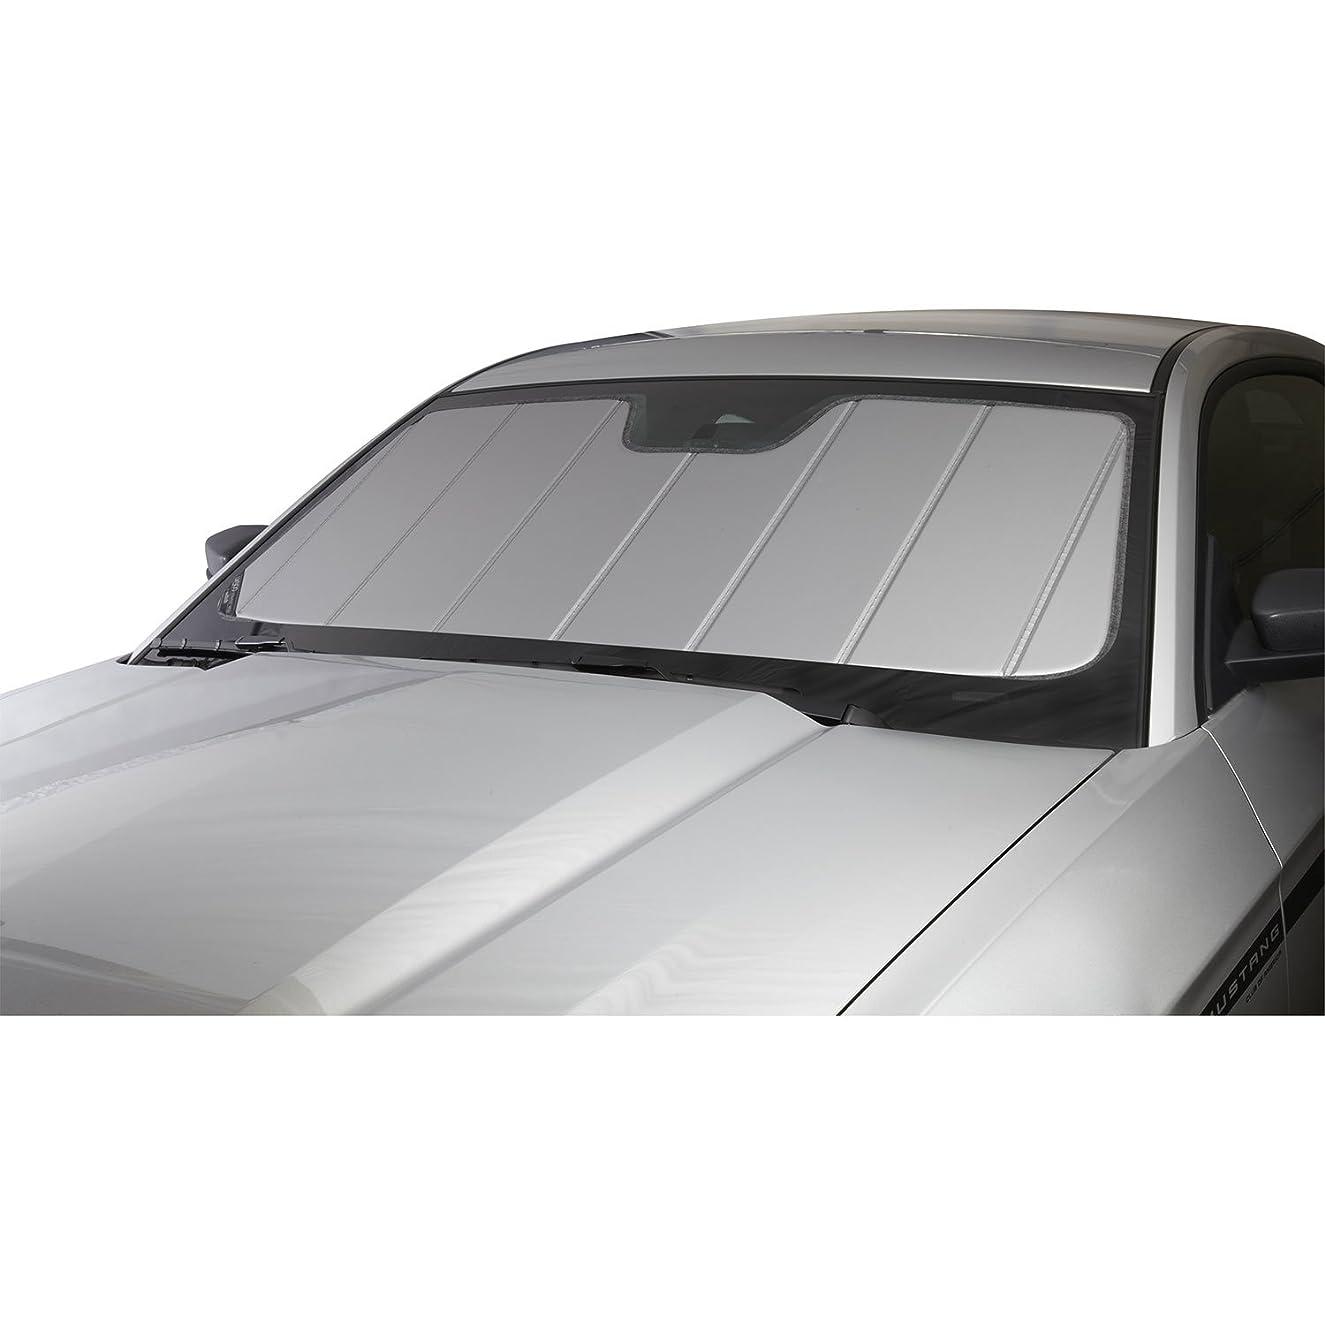 Covercraft UV11397SV Silver UVS 100 Custom Fit Sunscreen for Select Dodge Challenger Models - Laminate Material, 1 Pack